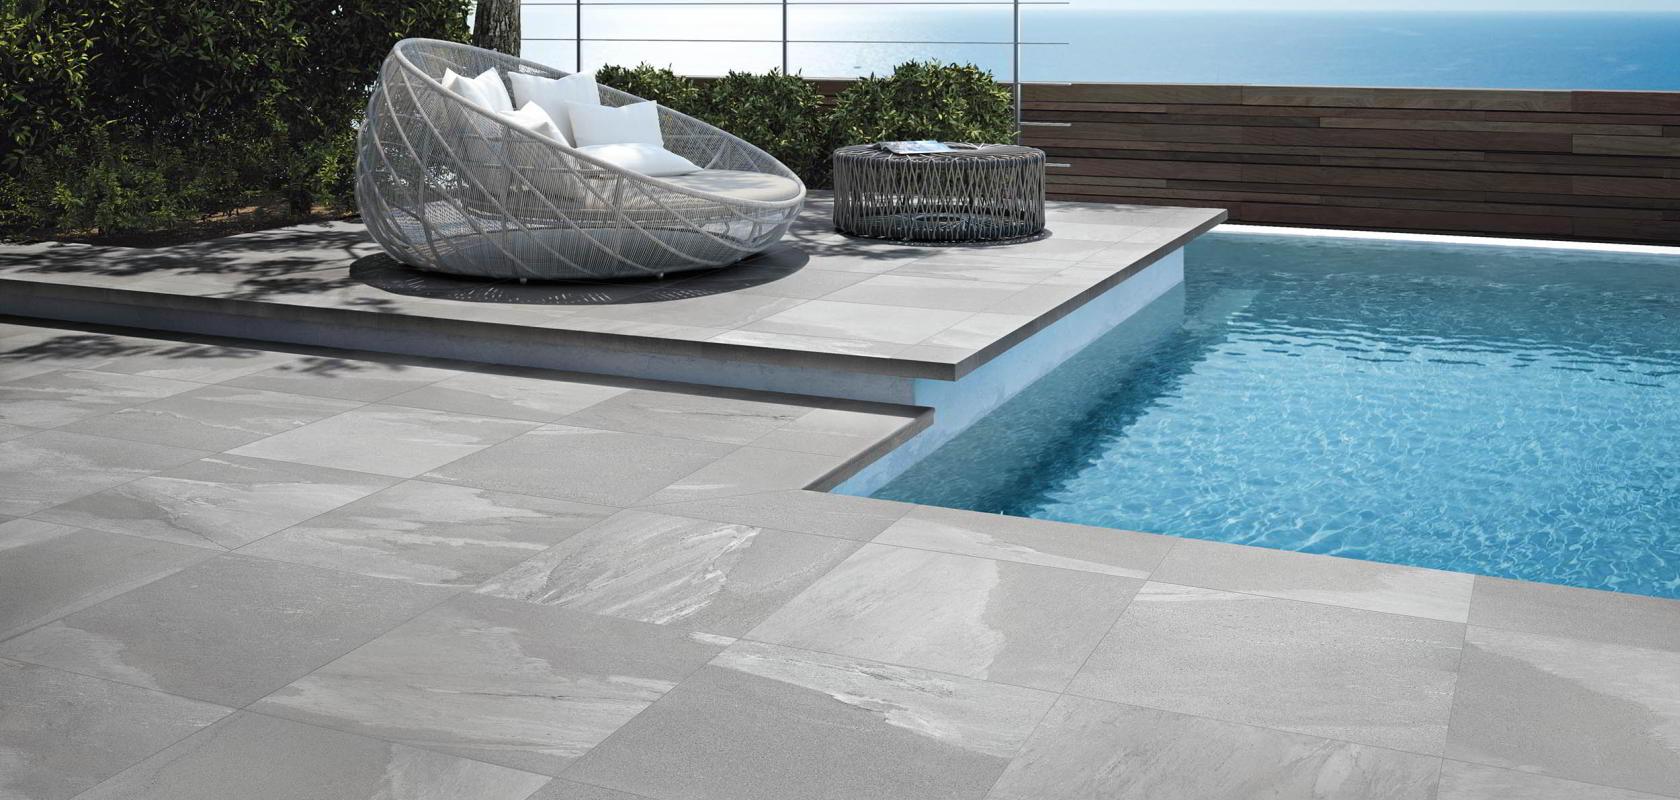 outdoor tiles outdoor ceramic tiles frost-resistant anti-slip porcelain stoneware RGMILJU